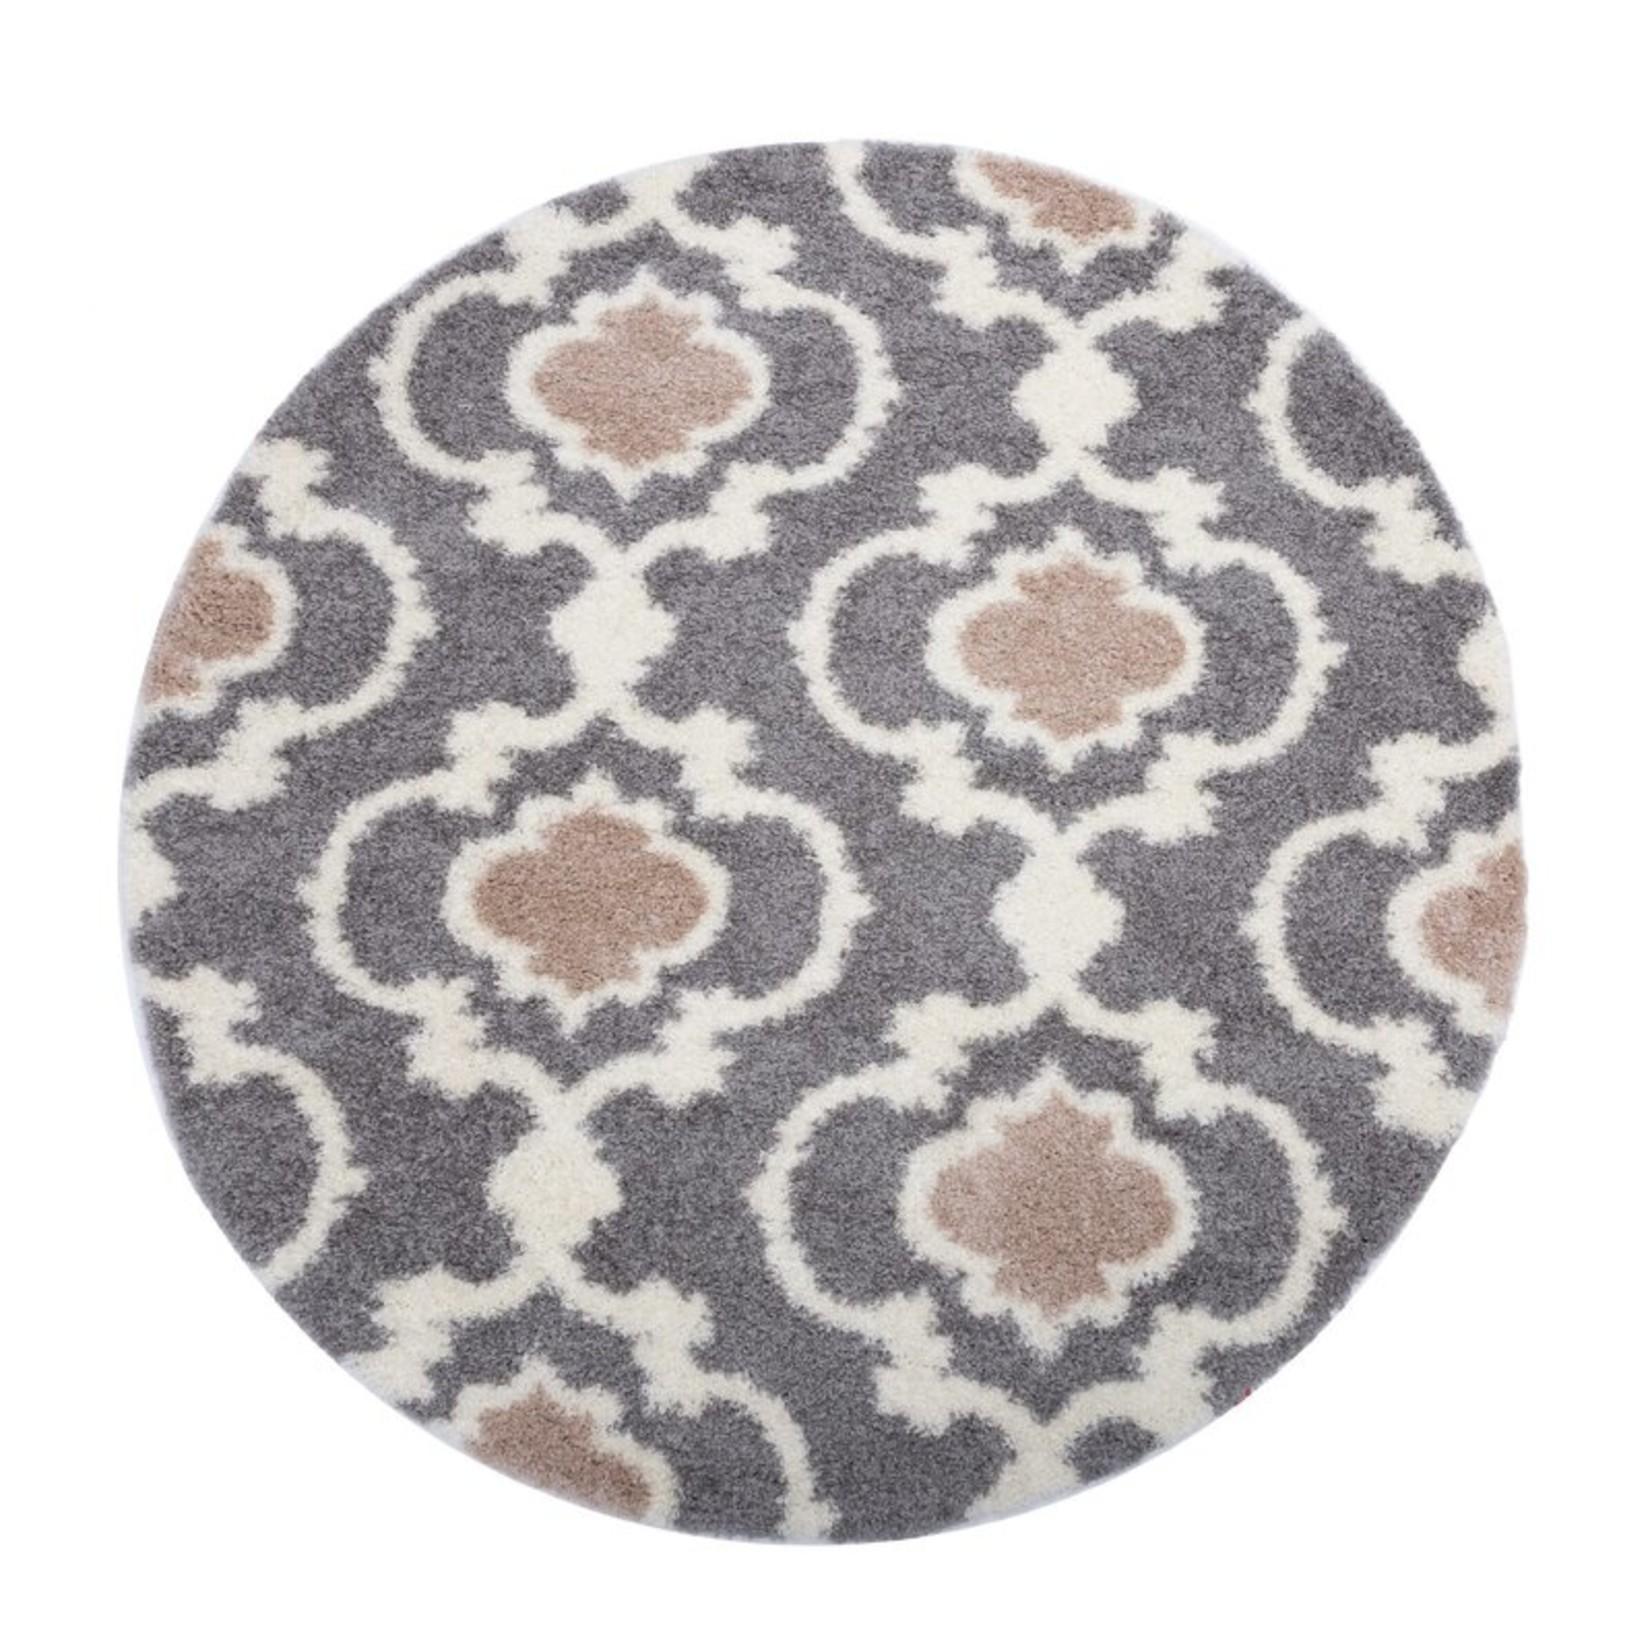 *6'6 Round - Hegwood Geometric Gray/Silver Area Rug